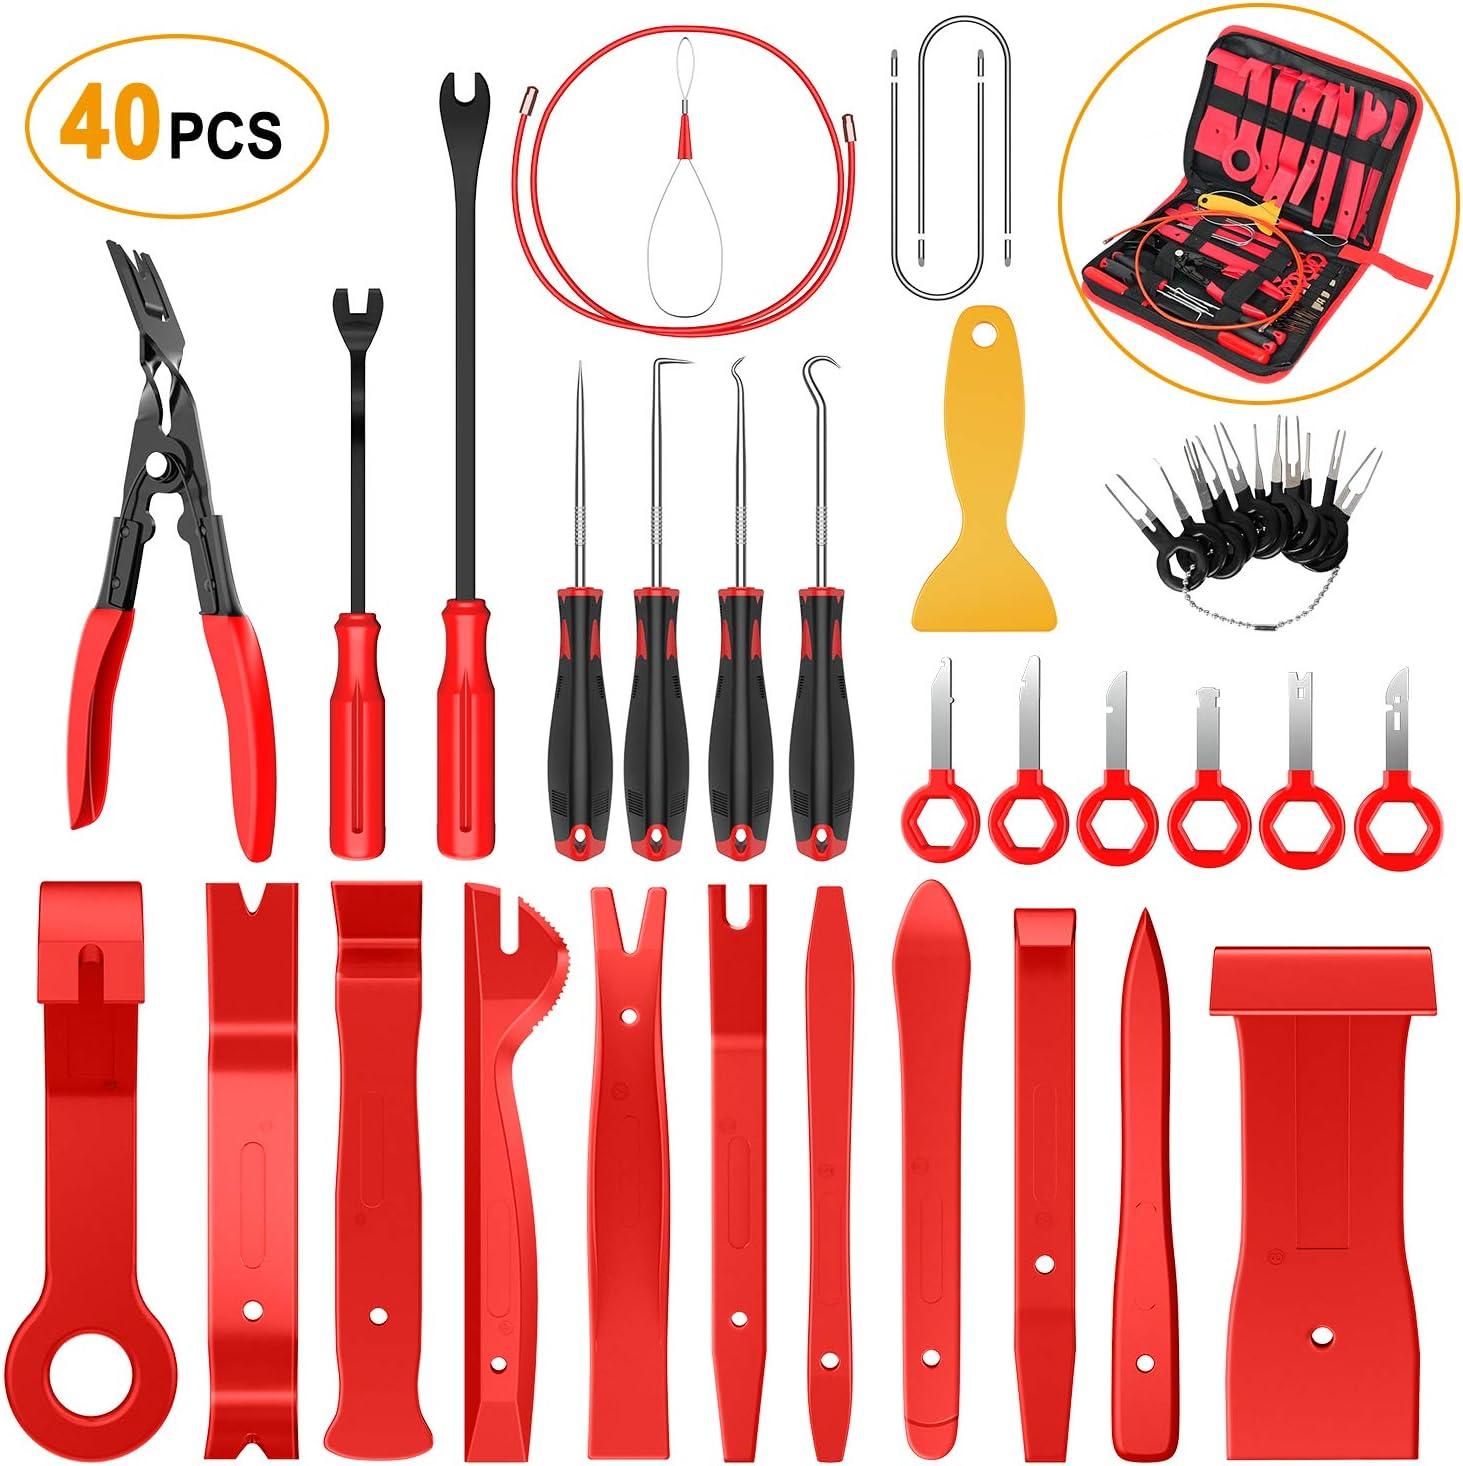 GOOACC 40Pcs Trim Removal Tool,Auto Terminal Removal Key Tool,Auto Clip Pliers Stereo Removal Tools,Car Upholstery Repair Pry Kit,Precision Hook and Pick Set,Wiring Threader,Car Film Scraper